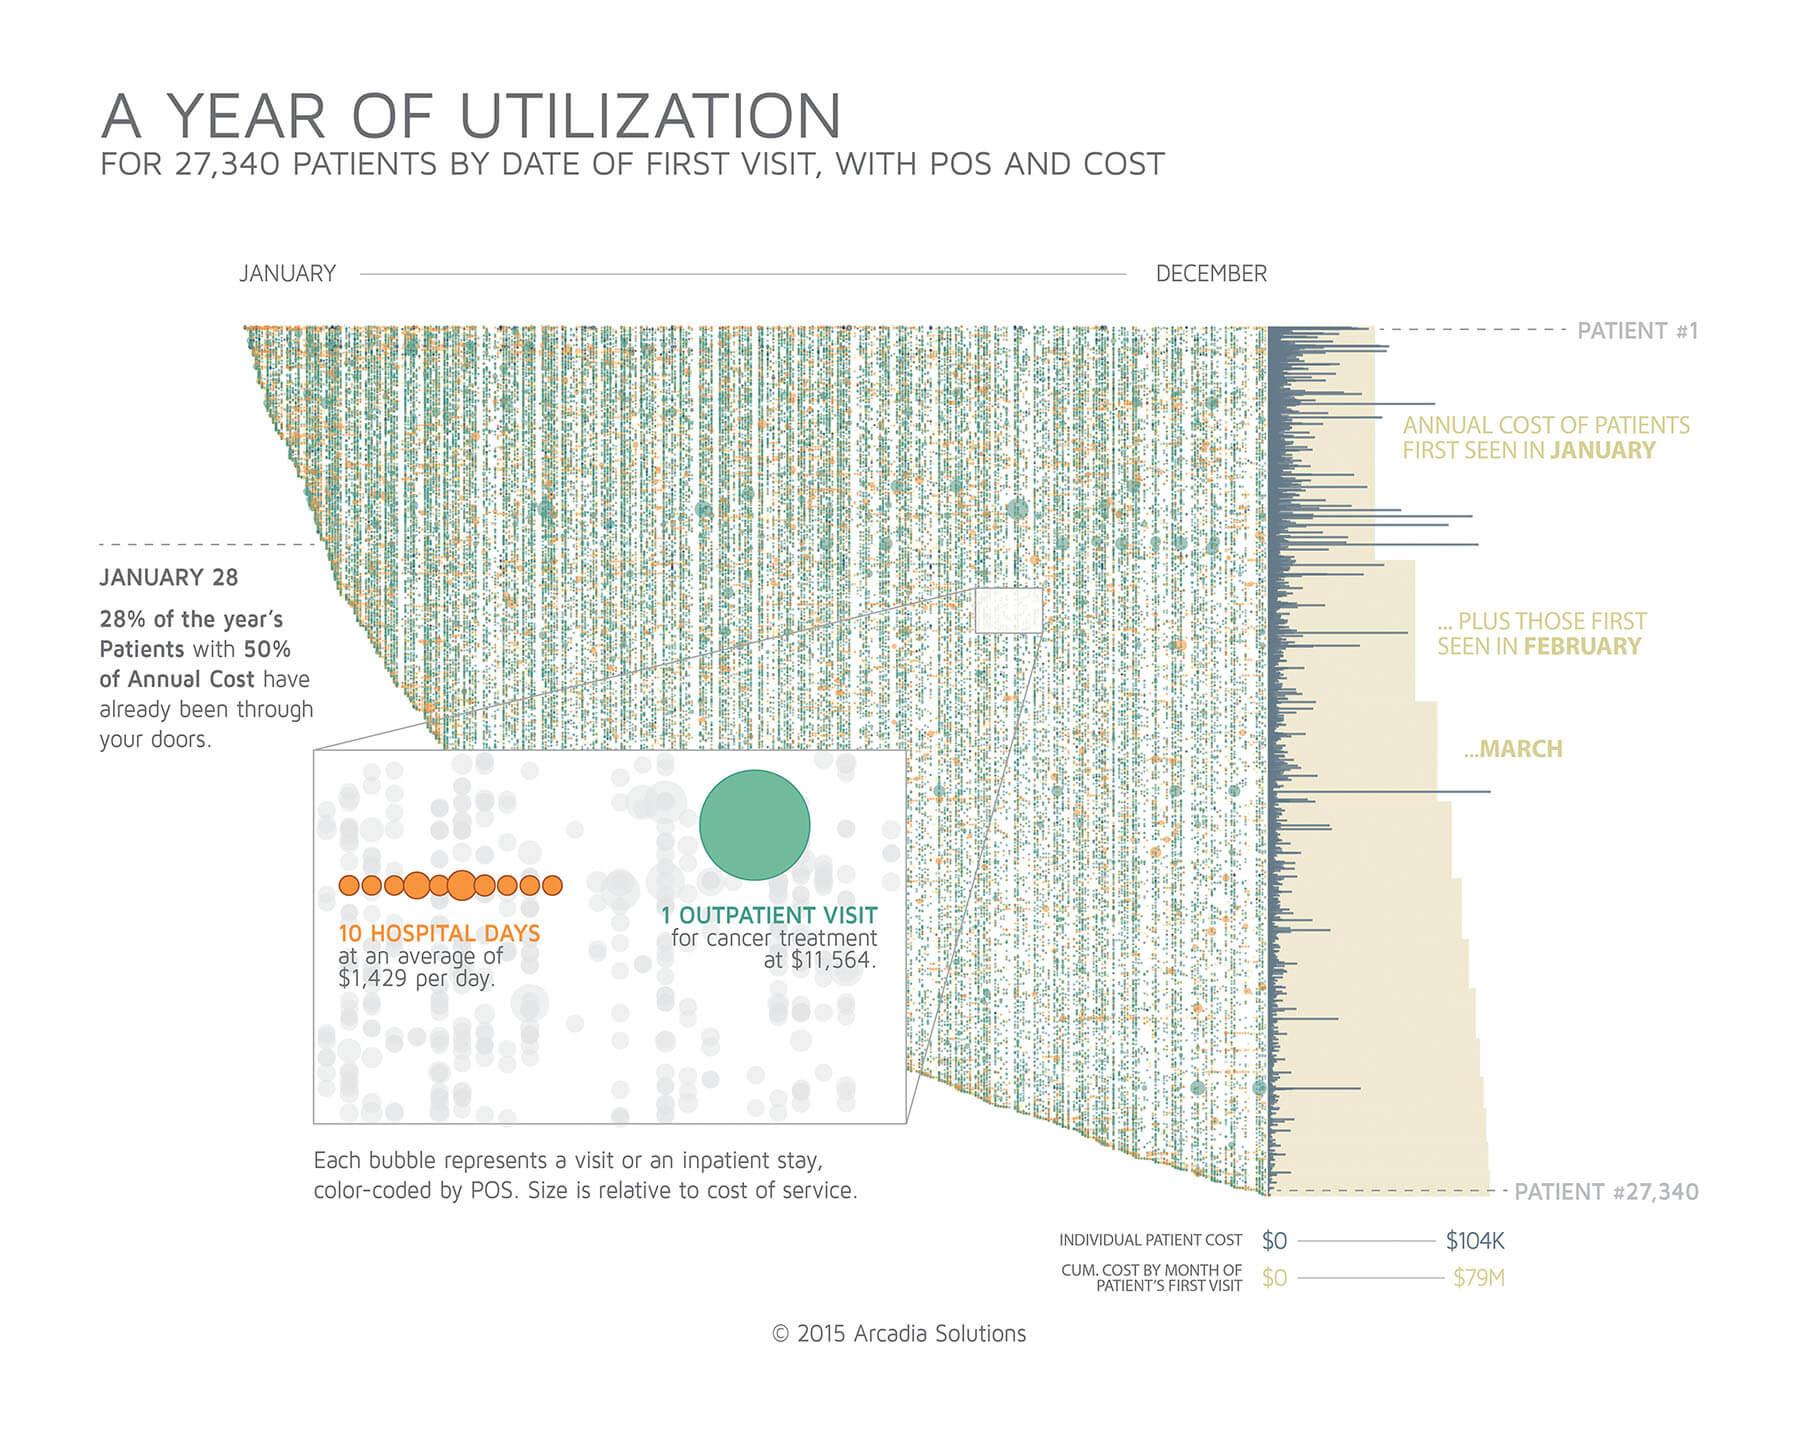 yearOfUtilization.jpg